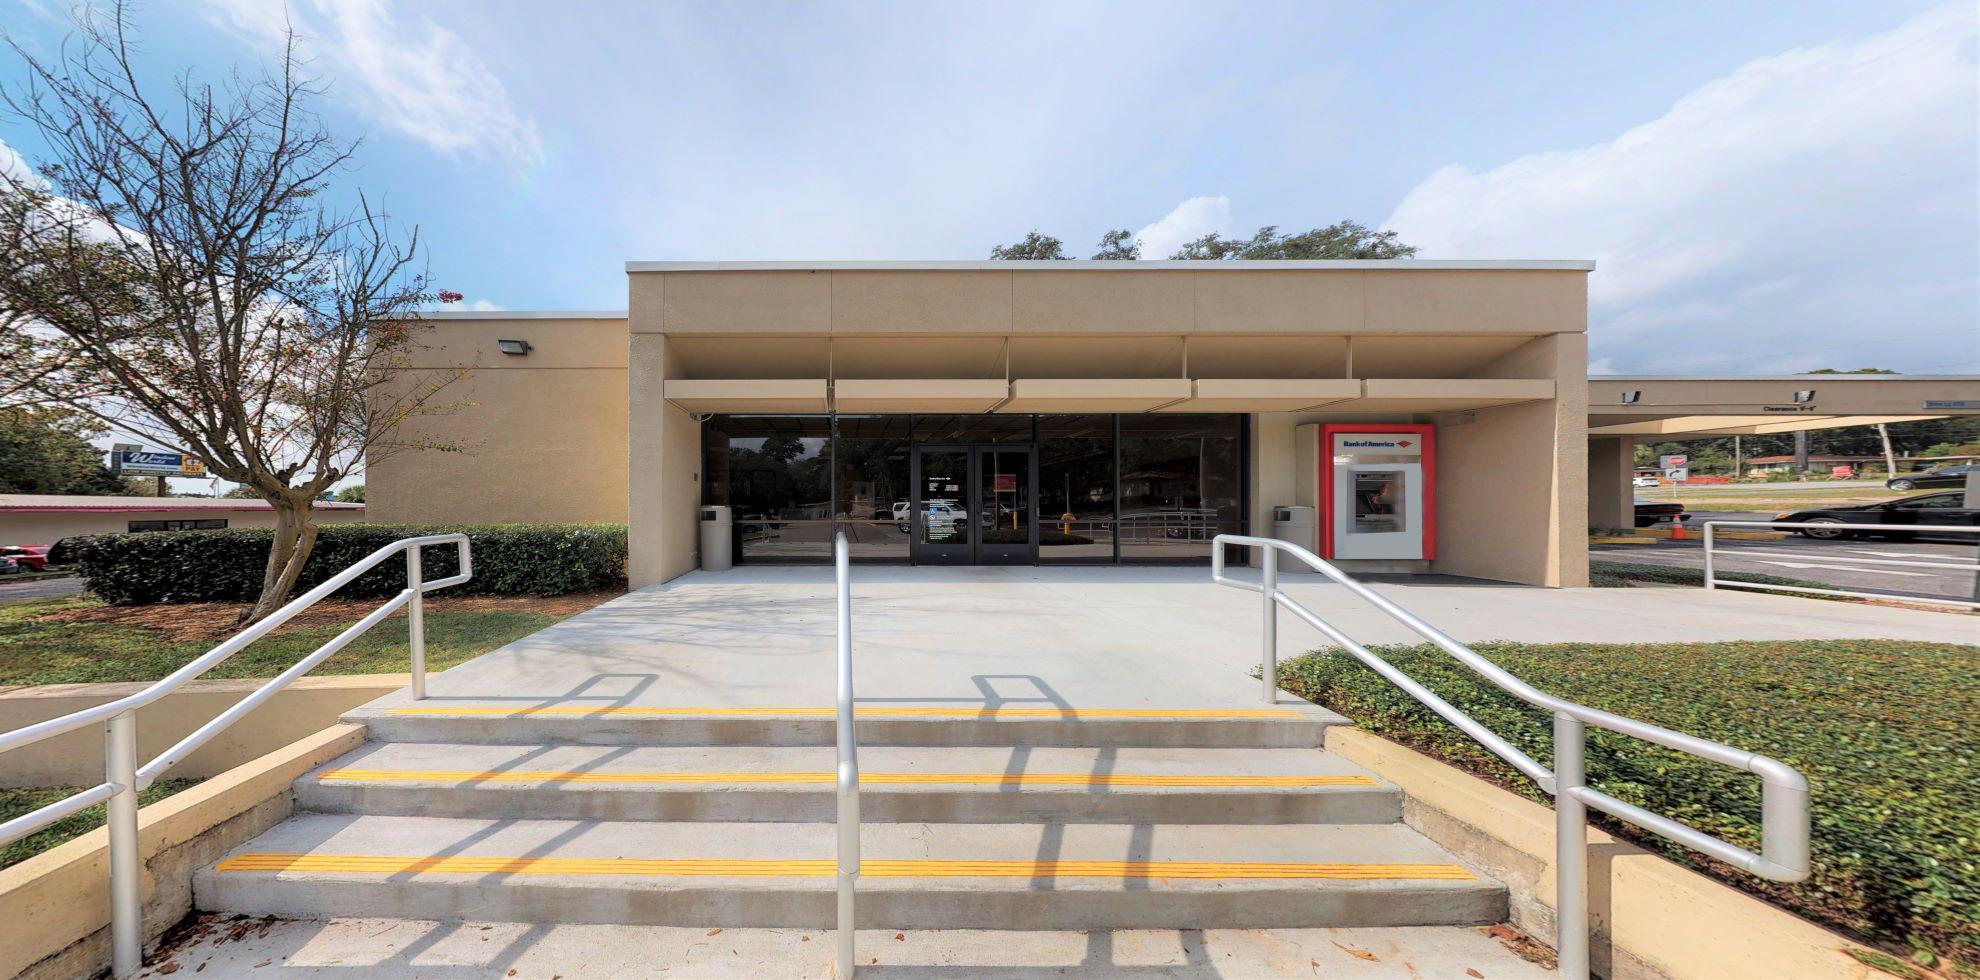 Bank of America financial center with drive-thru ATM | 206 N New Warrington Rd, Pensacola, FL 32506